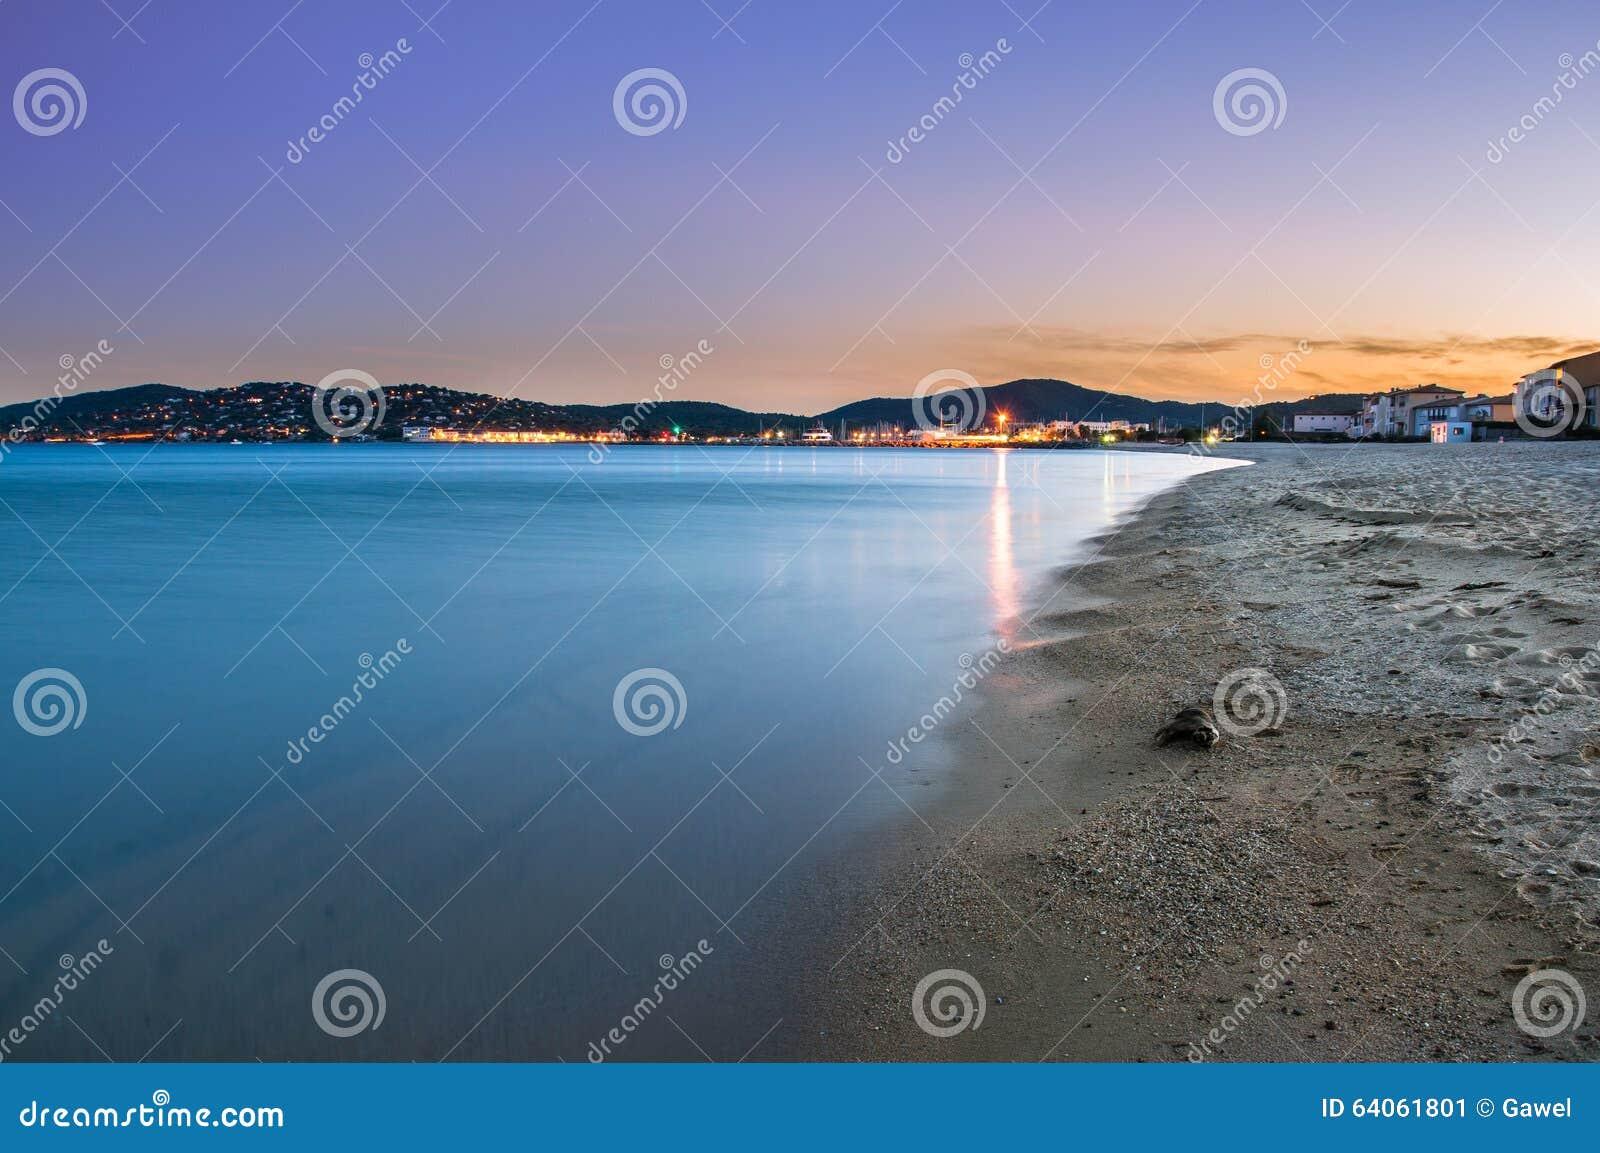 Sunset lights at Port Grimaud, France